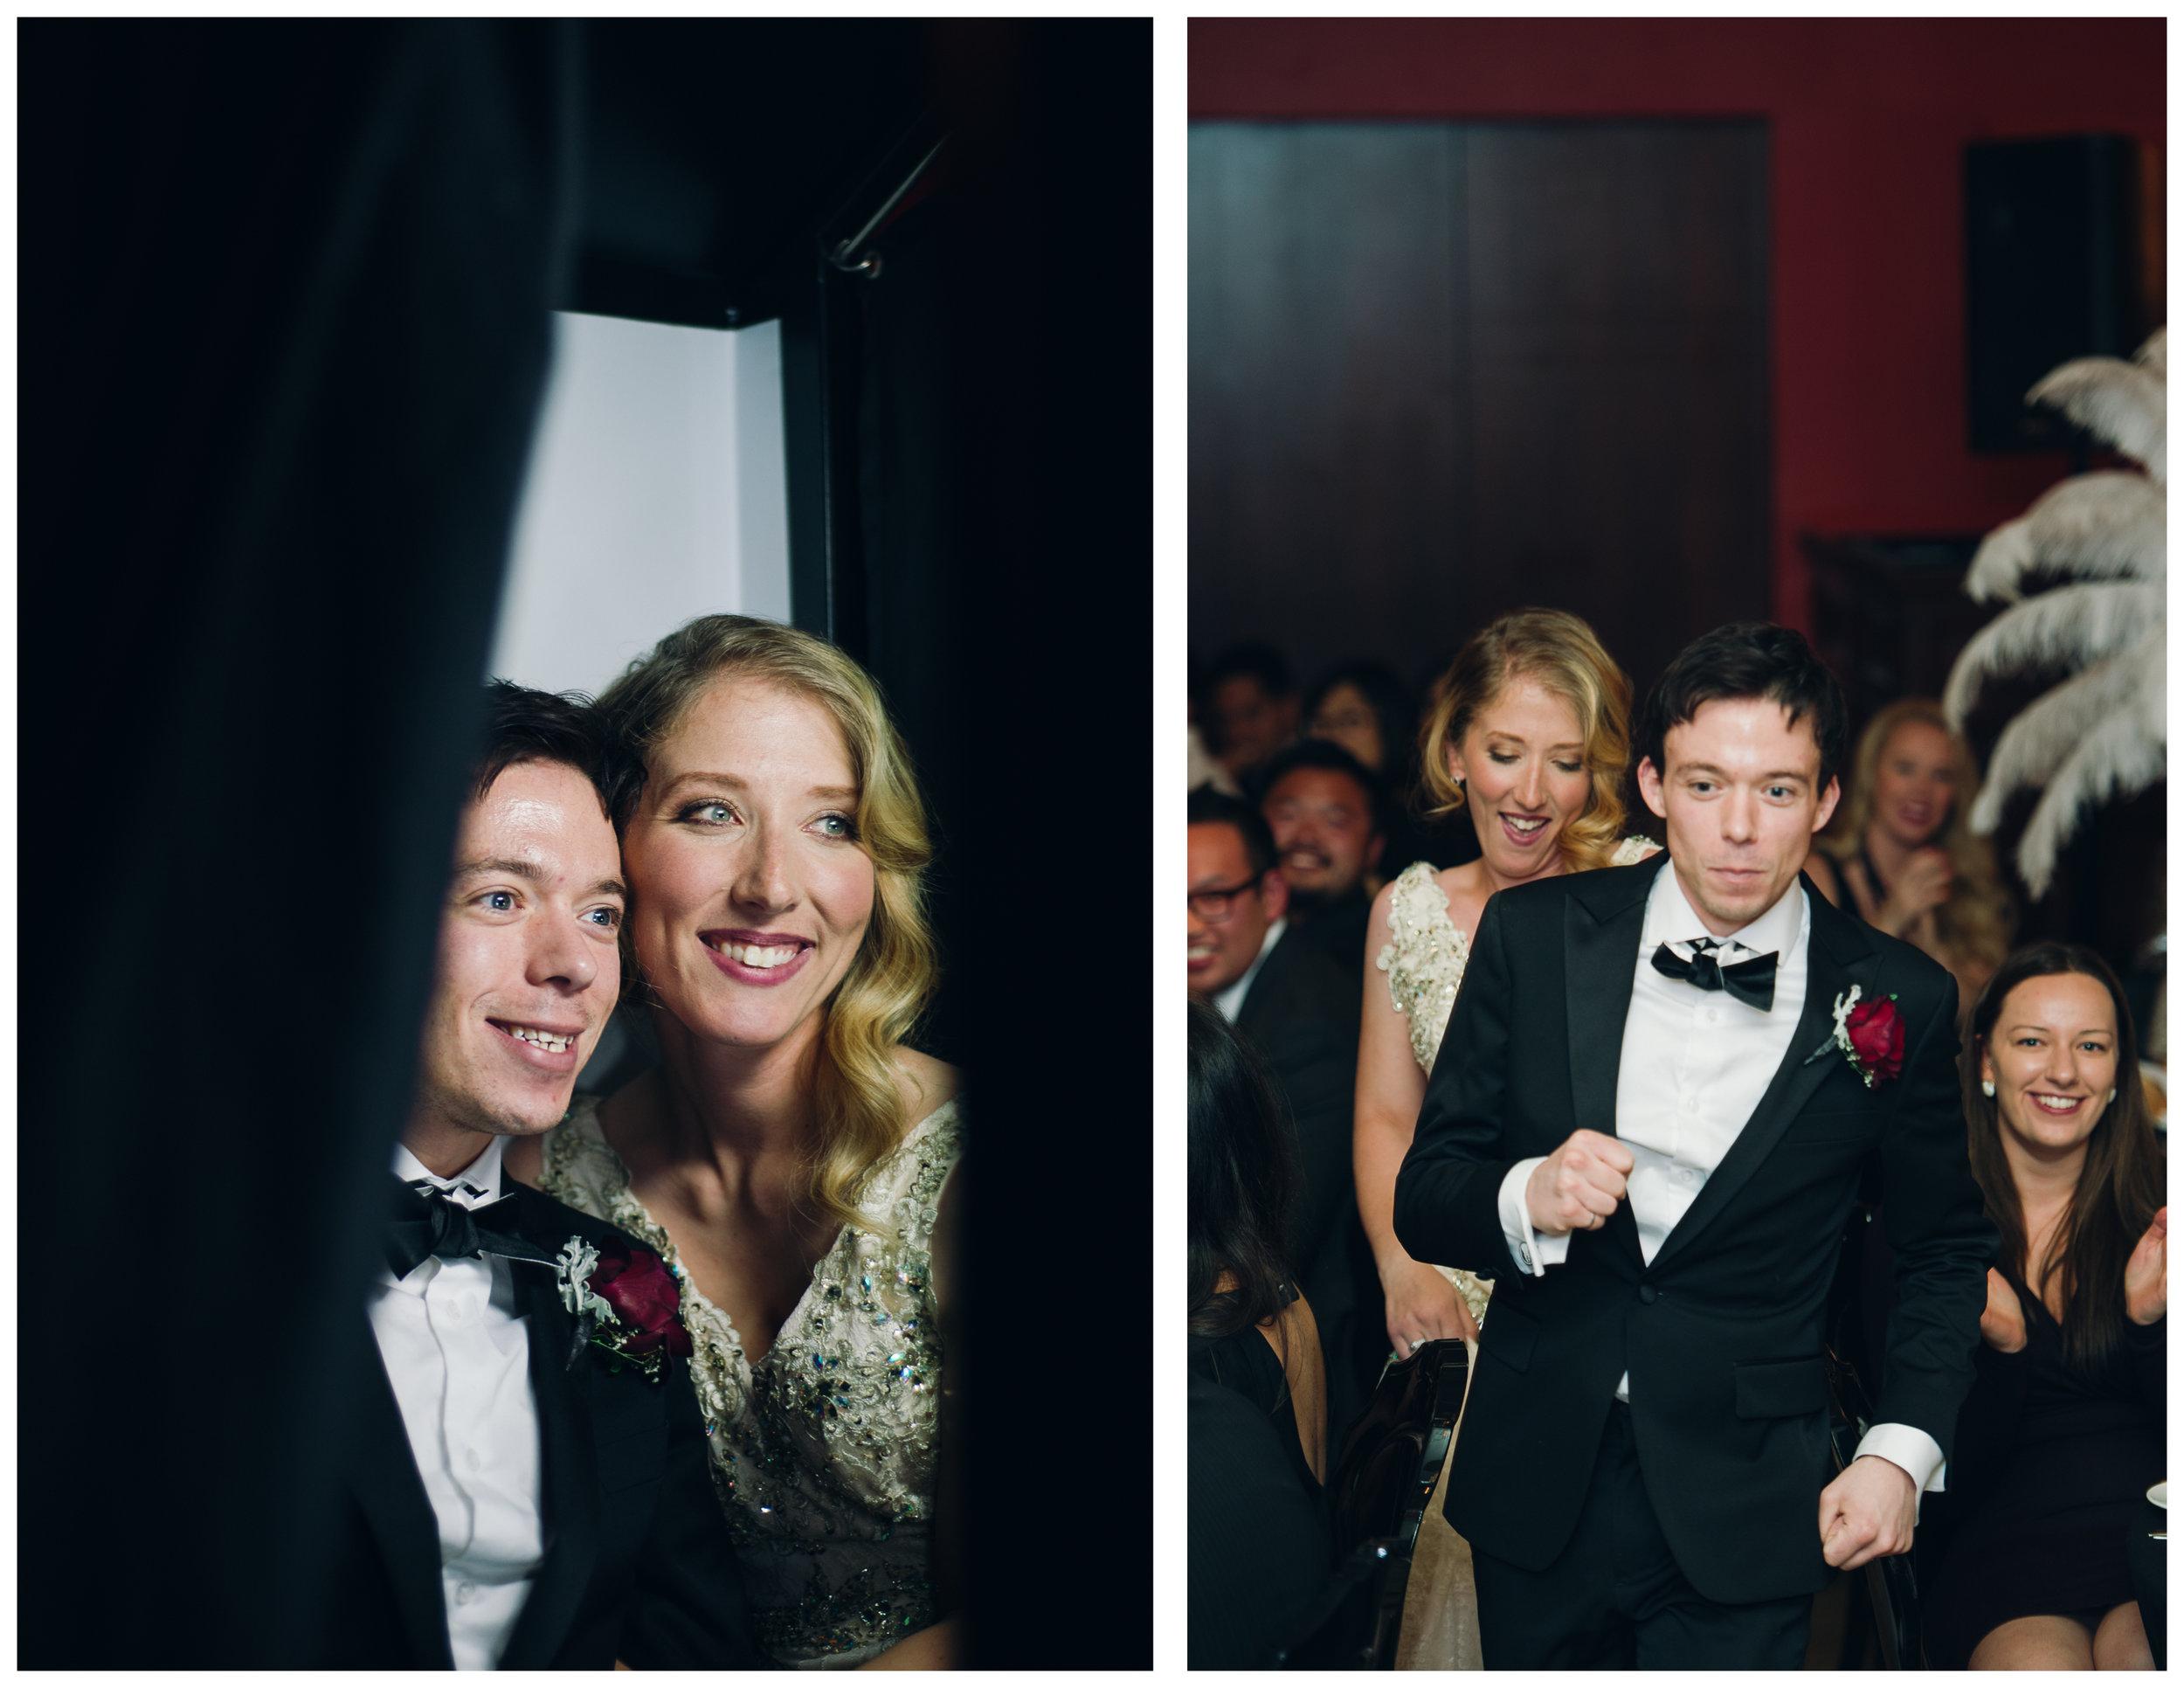 Gladstone Great Gastby Wedding 2x2_15.jpg